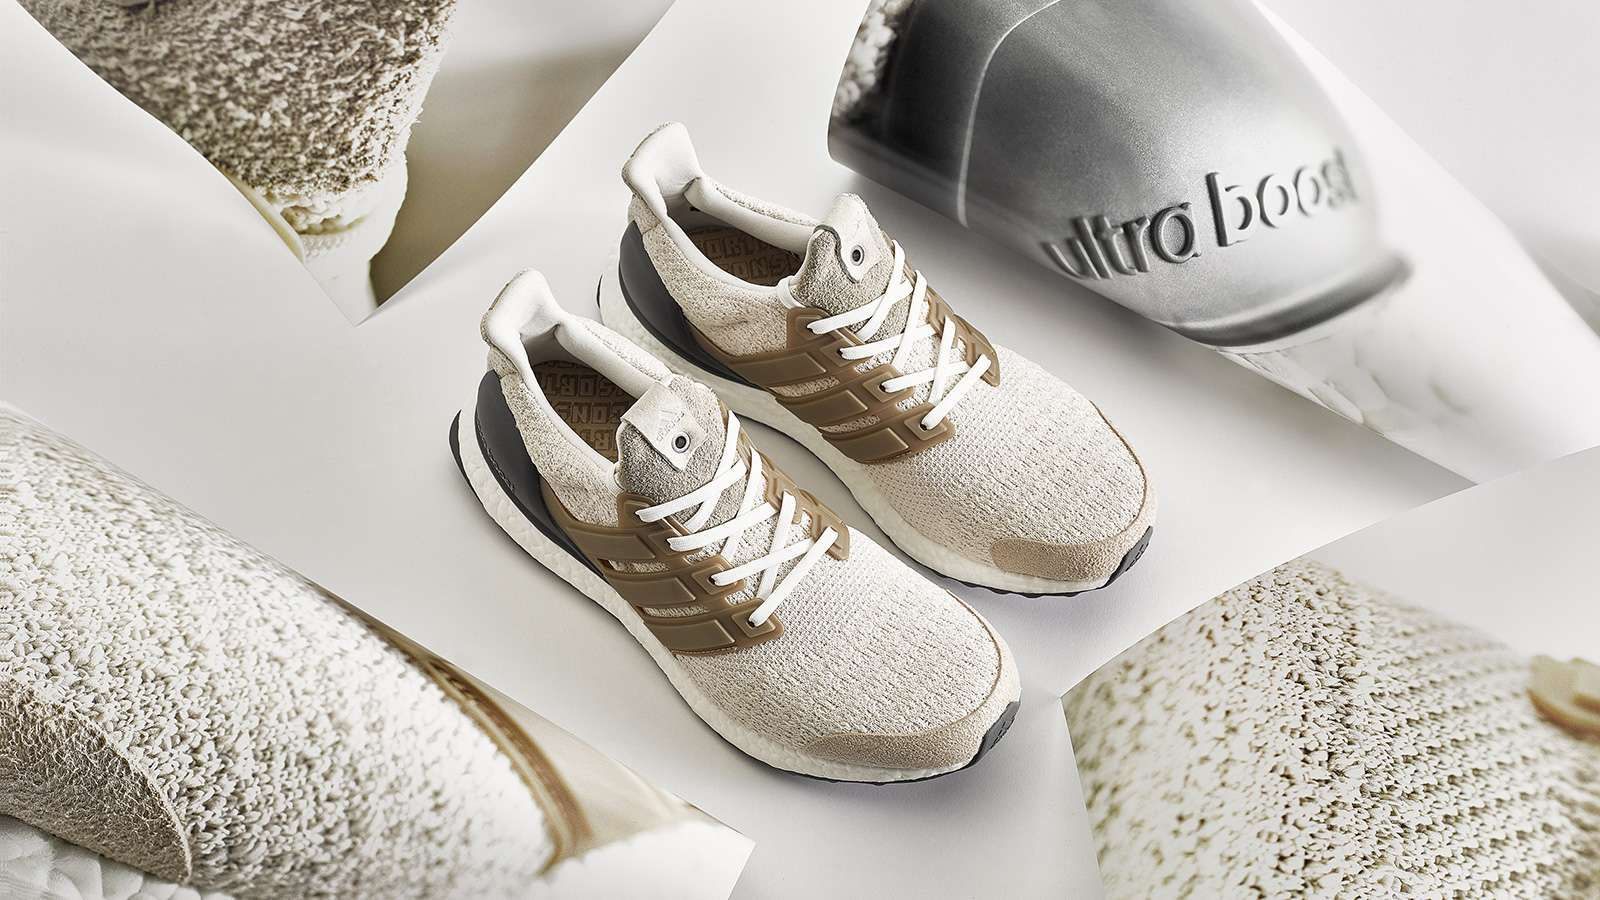 4b06506fe20 adidas Consortium Ultraboost Lux DB0338 Adidas Sneakers